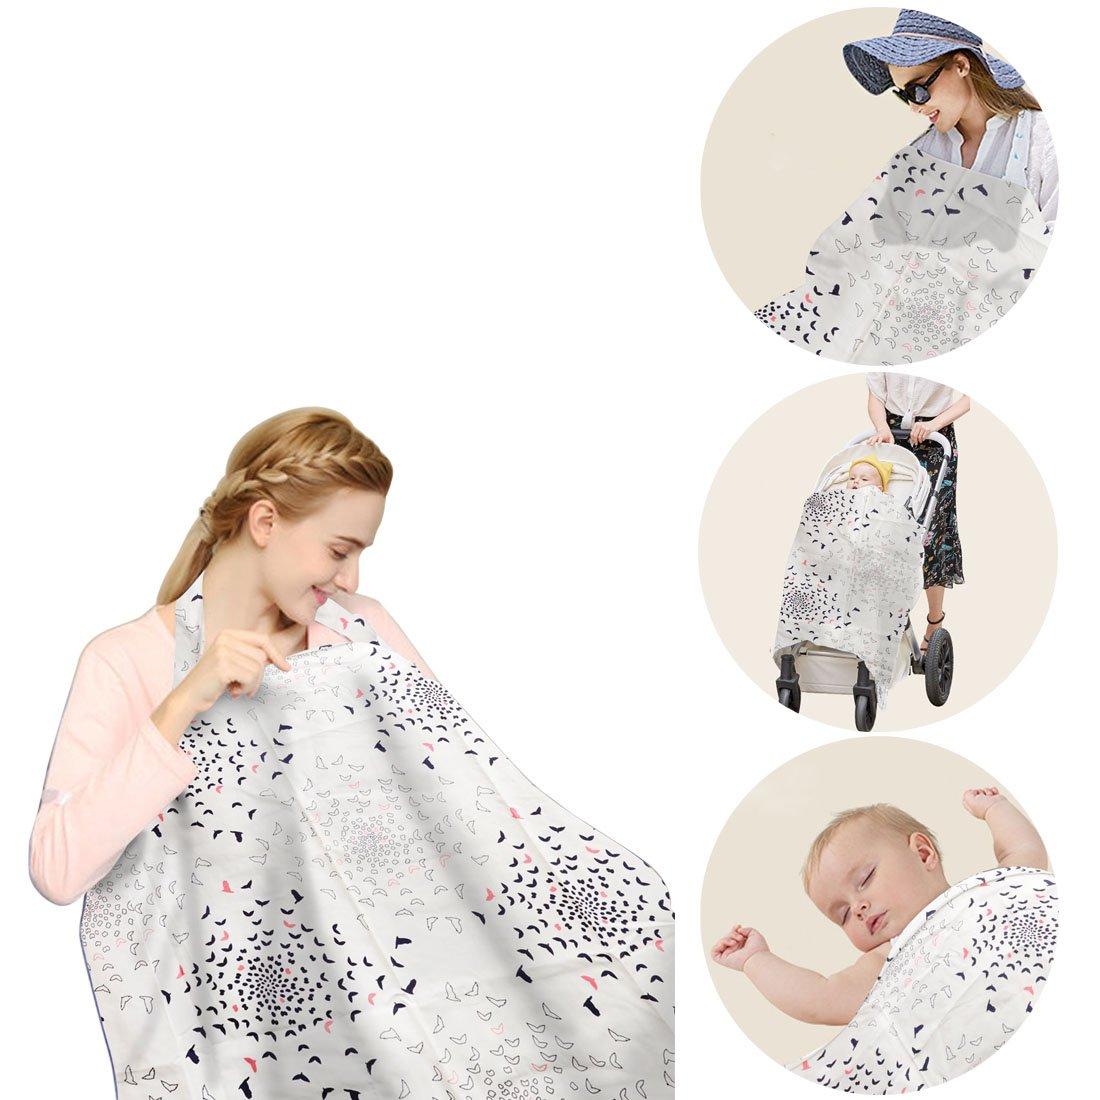 HB homeboat® Mama Designs Mama bufanda bufanda de lactancia Lactancia Cover MakingDay